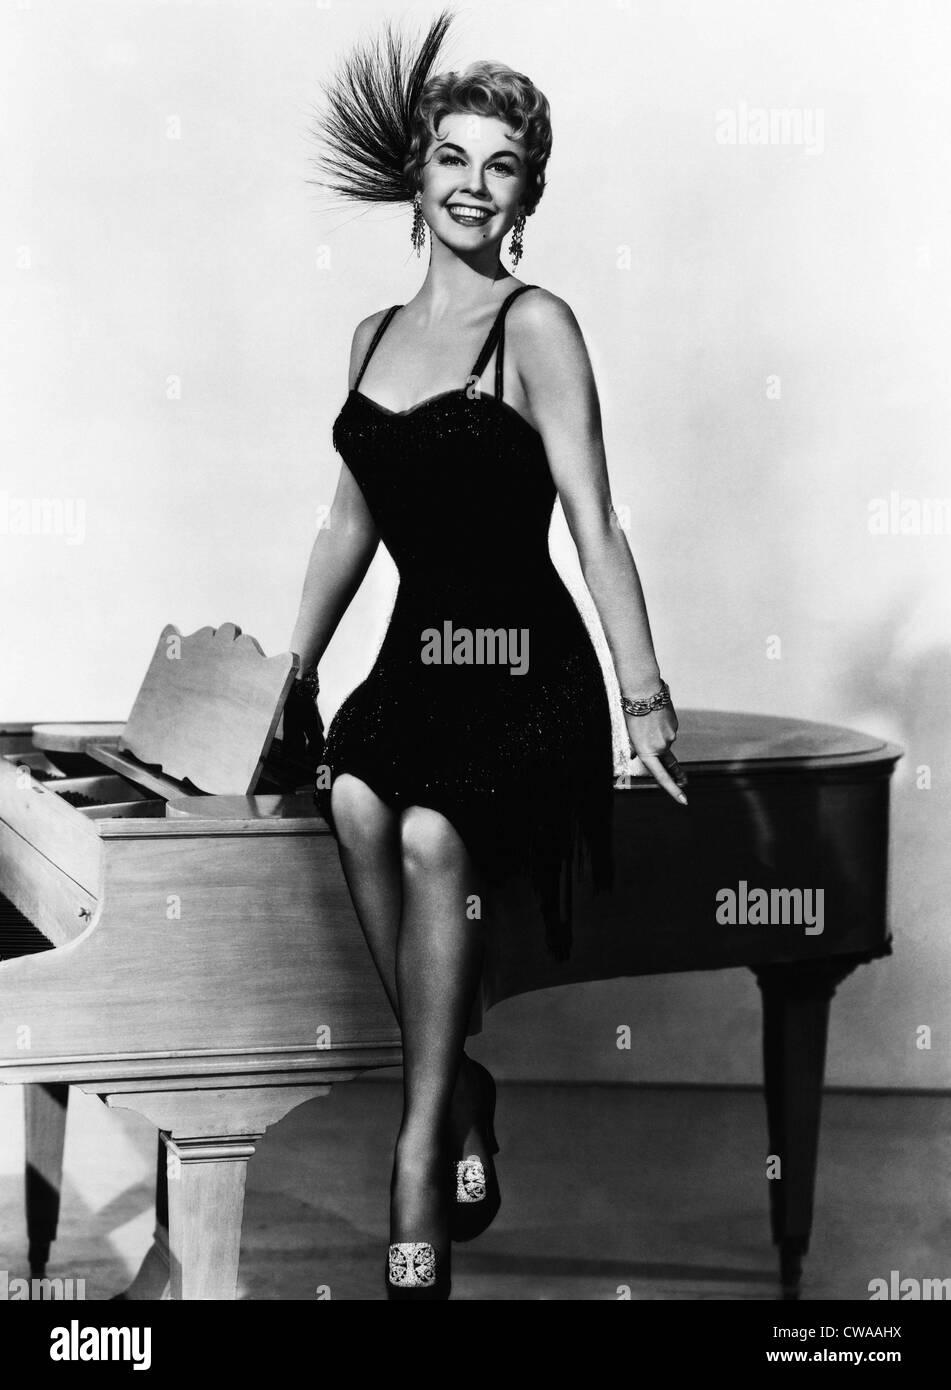 LOVE ME OR LEAVE ME, Doris Day, 1955. Höflichkeit: CSU Archive / Everett Collection Stockbild